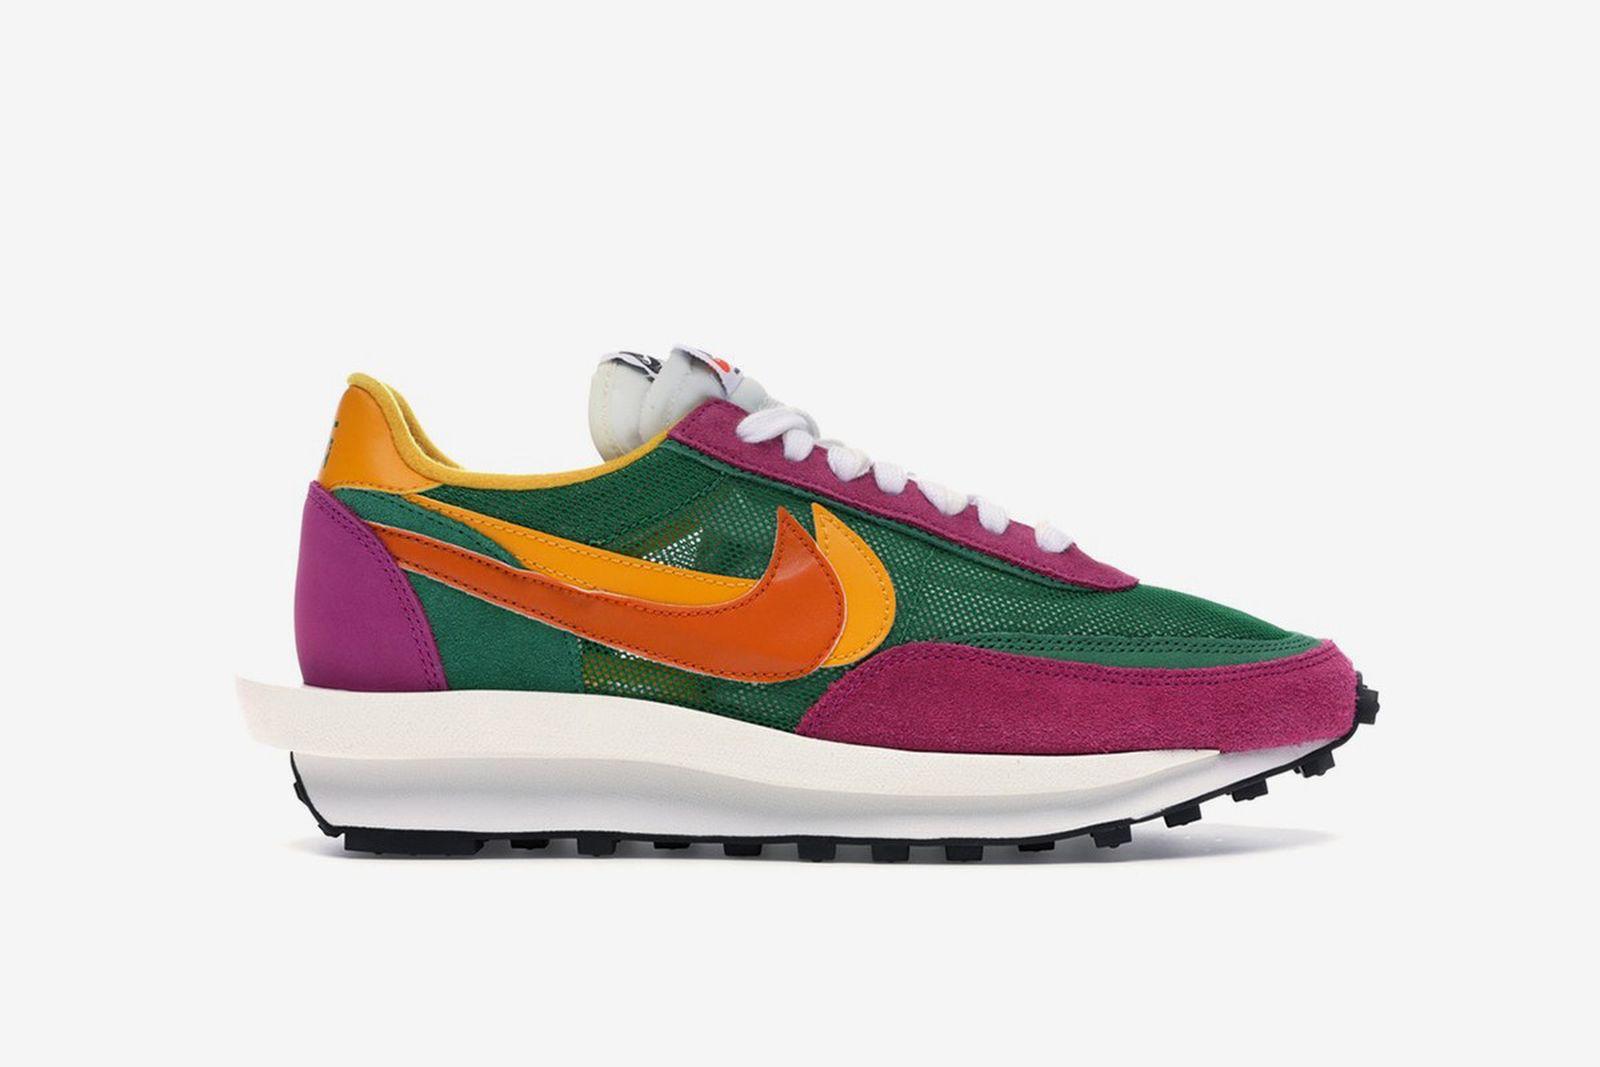 Shop the New sacai x Nike LDWaffle Colorways Here